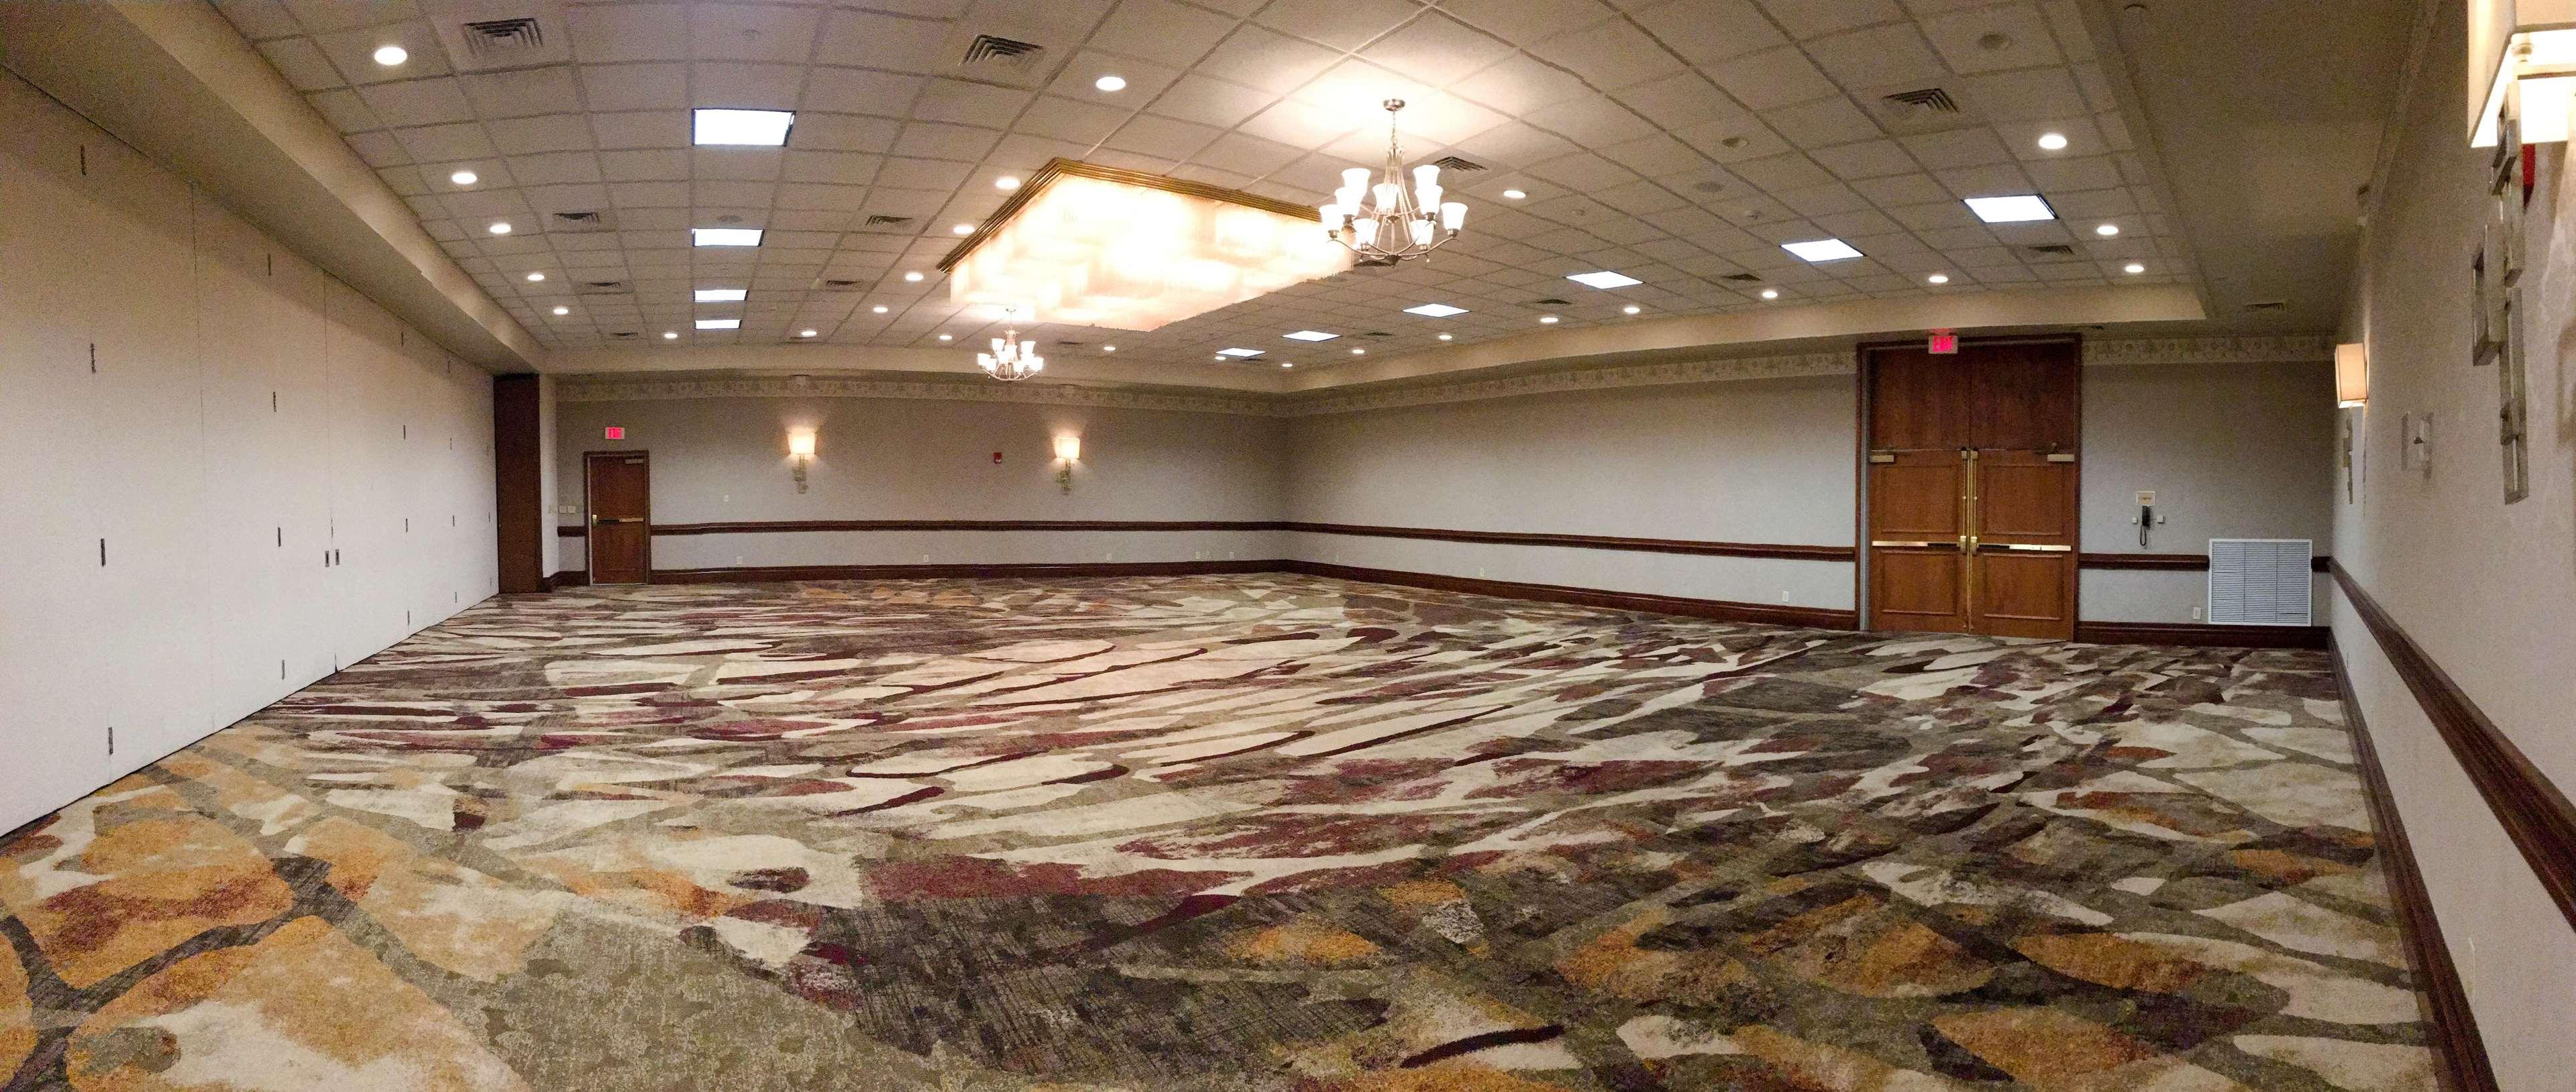 Heritage Ballroom